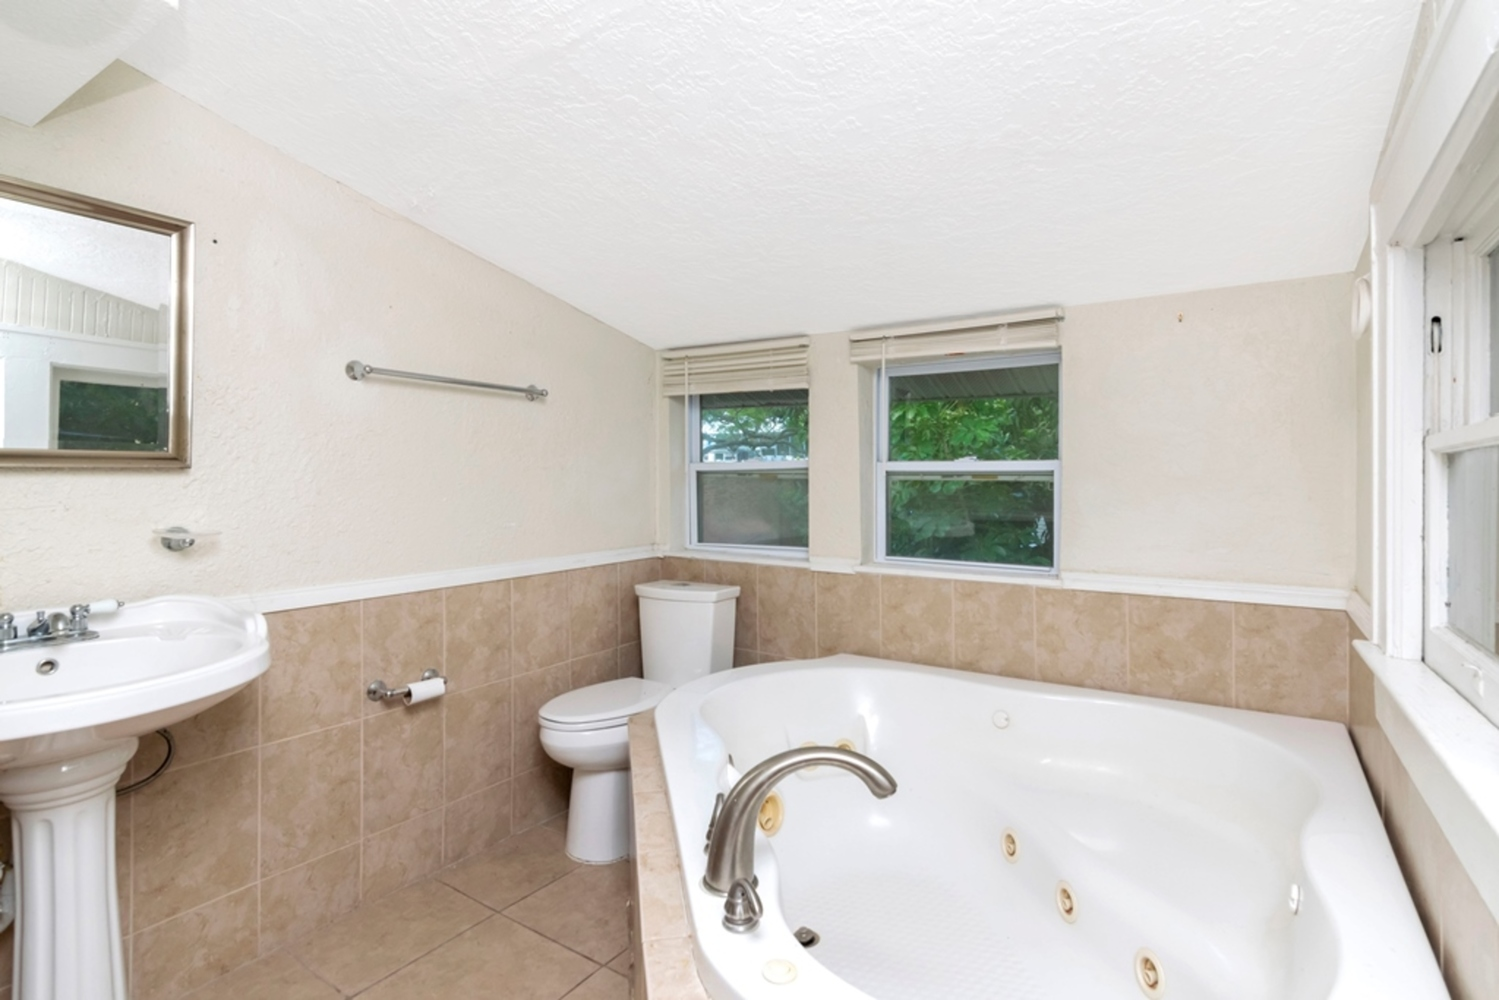 31 master bathroom